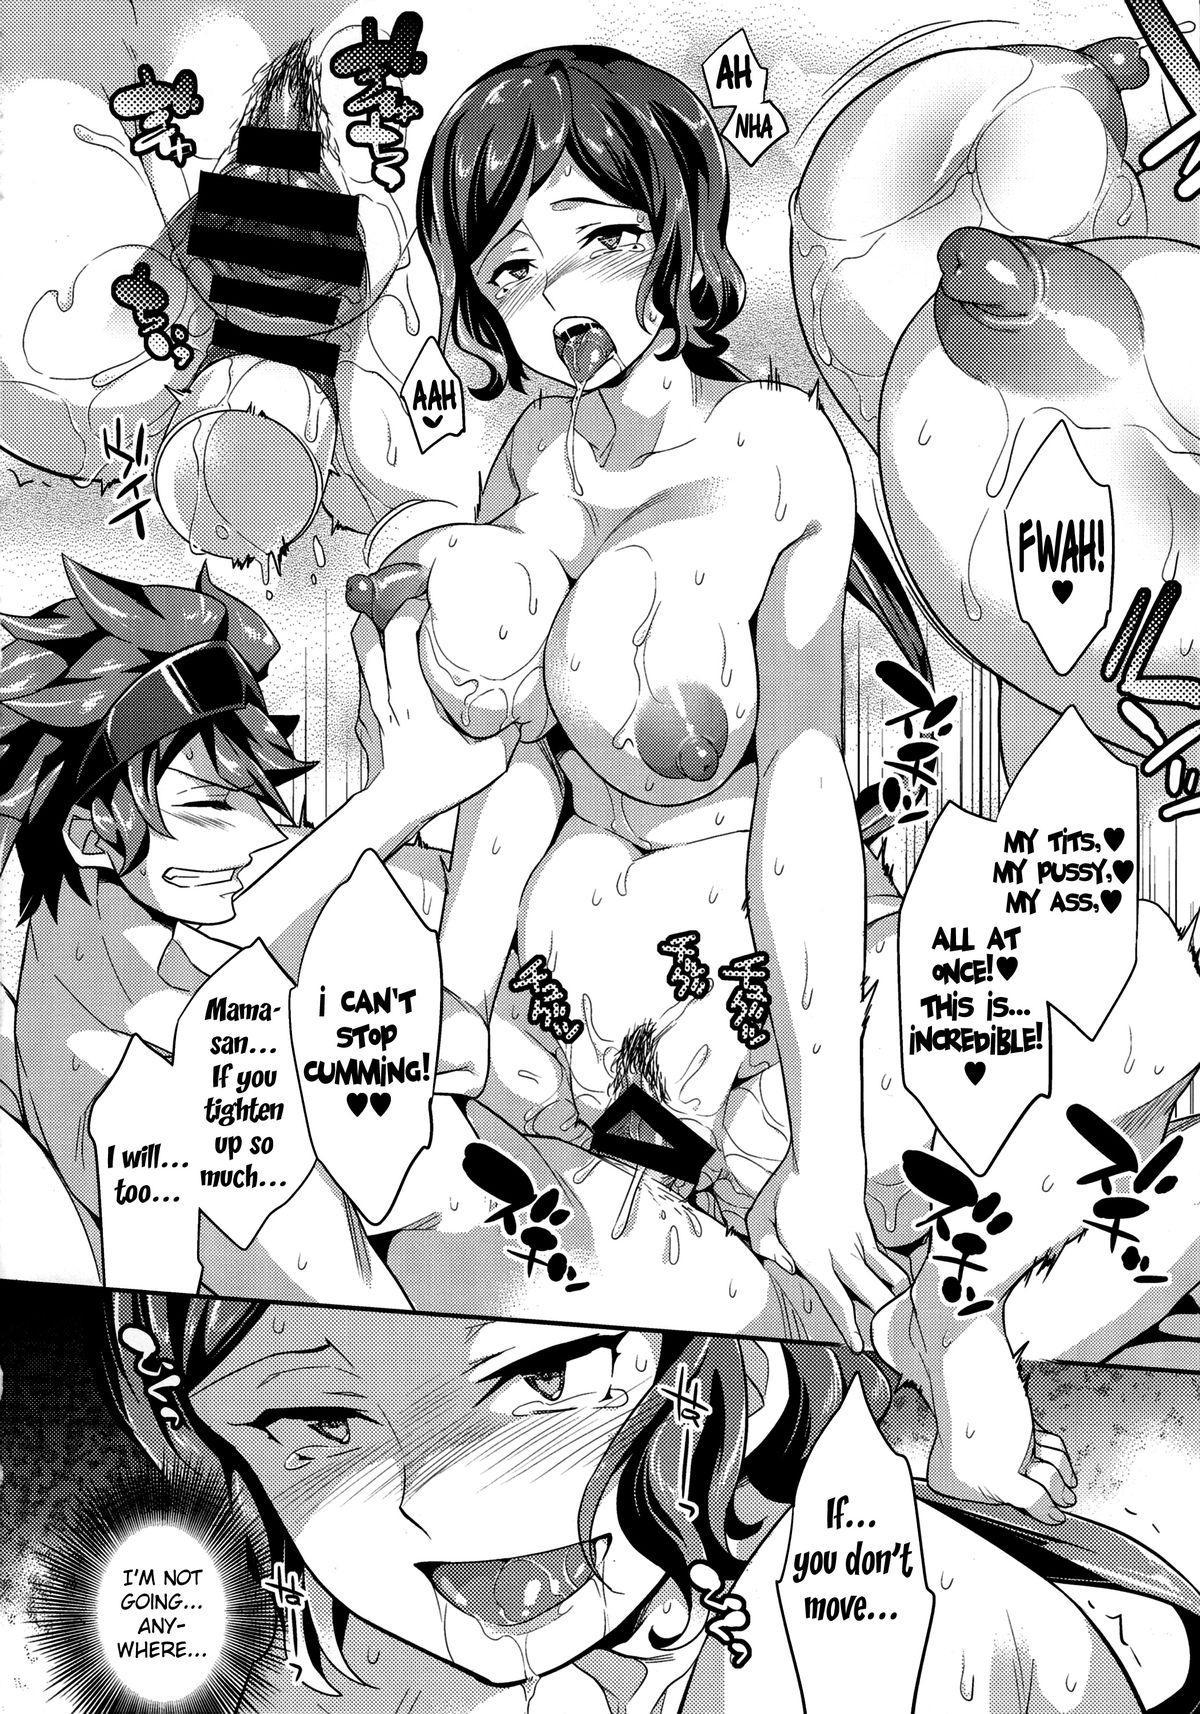 (C85) [Crazy9 (Ichitaka)] C9-09 Rinko Mama to Himitsu no Oasobi   C9-09 Secret Play with Mama Rinko (Gundam Build Fighters) [English] {doujin-moe.us} 22